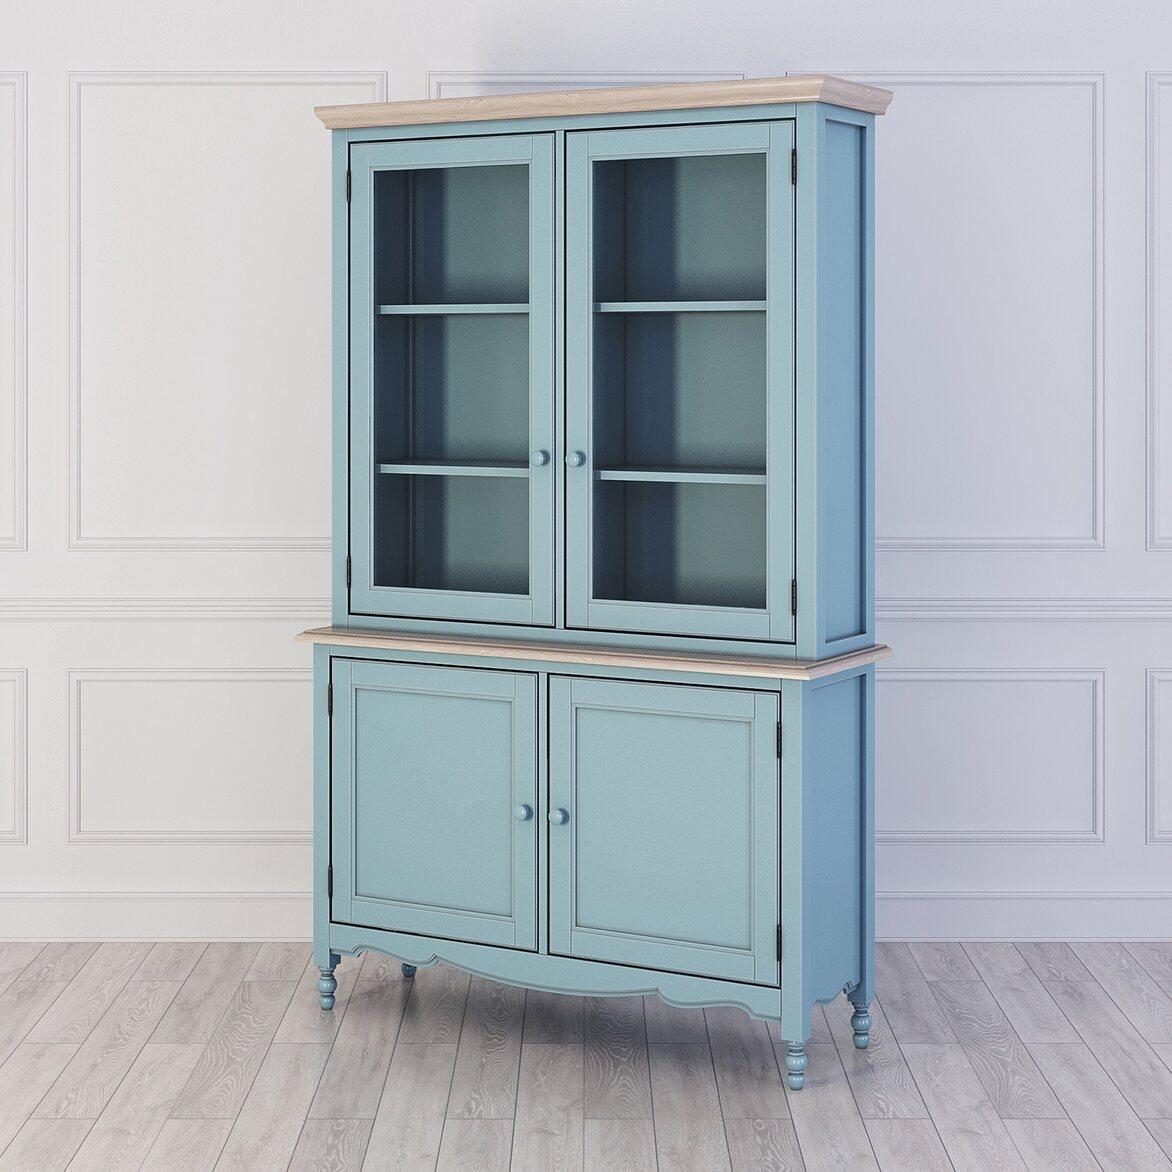 Буфет Leblanc, голубой | Буфеты Kingsby